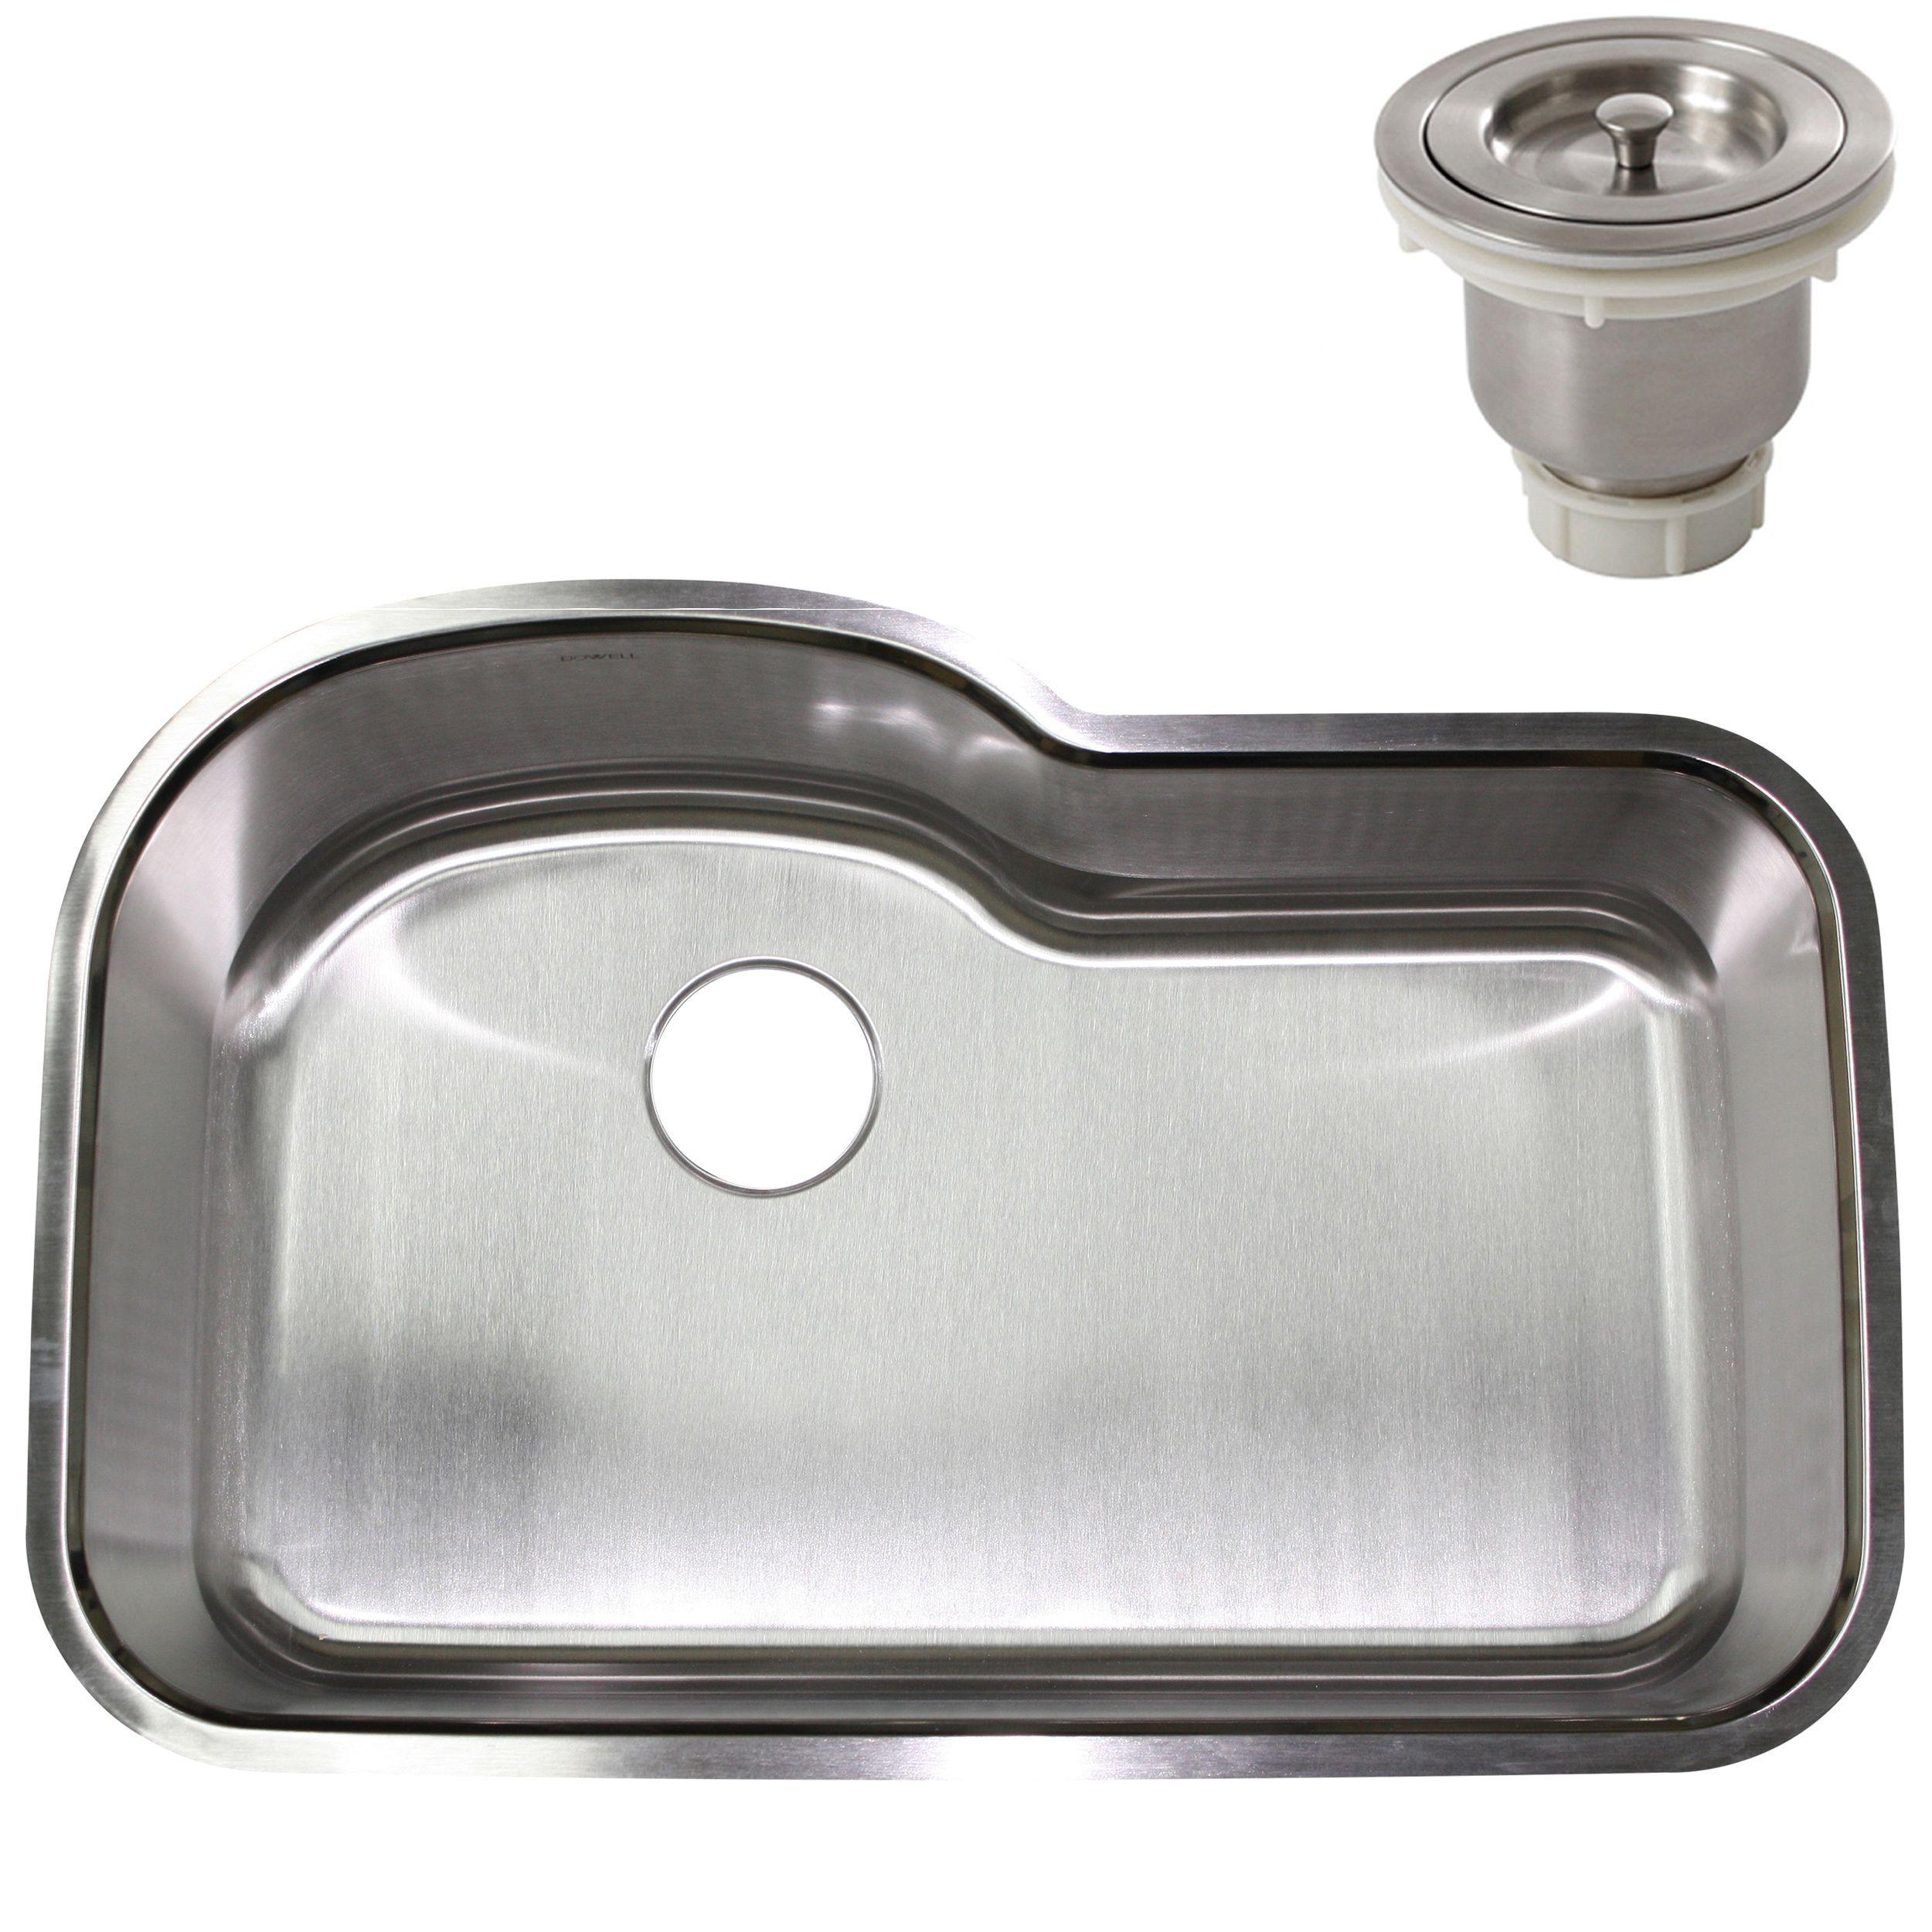 32inch stainless steel undermount single bowl kitchen